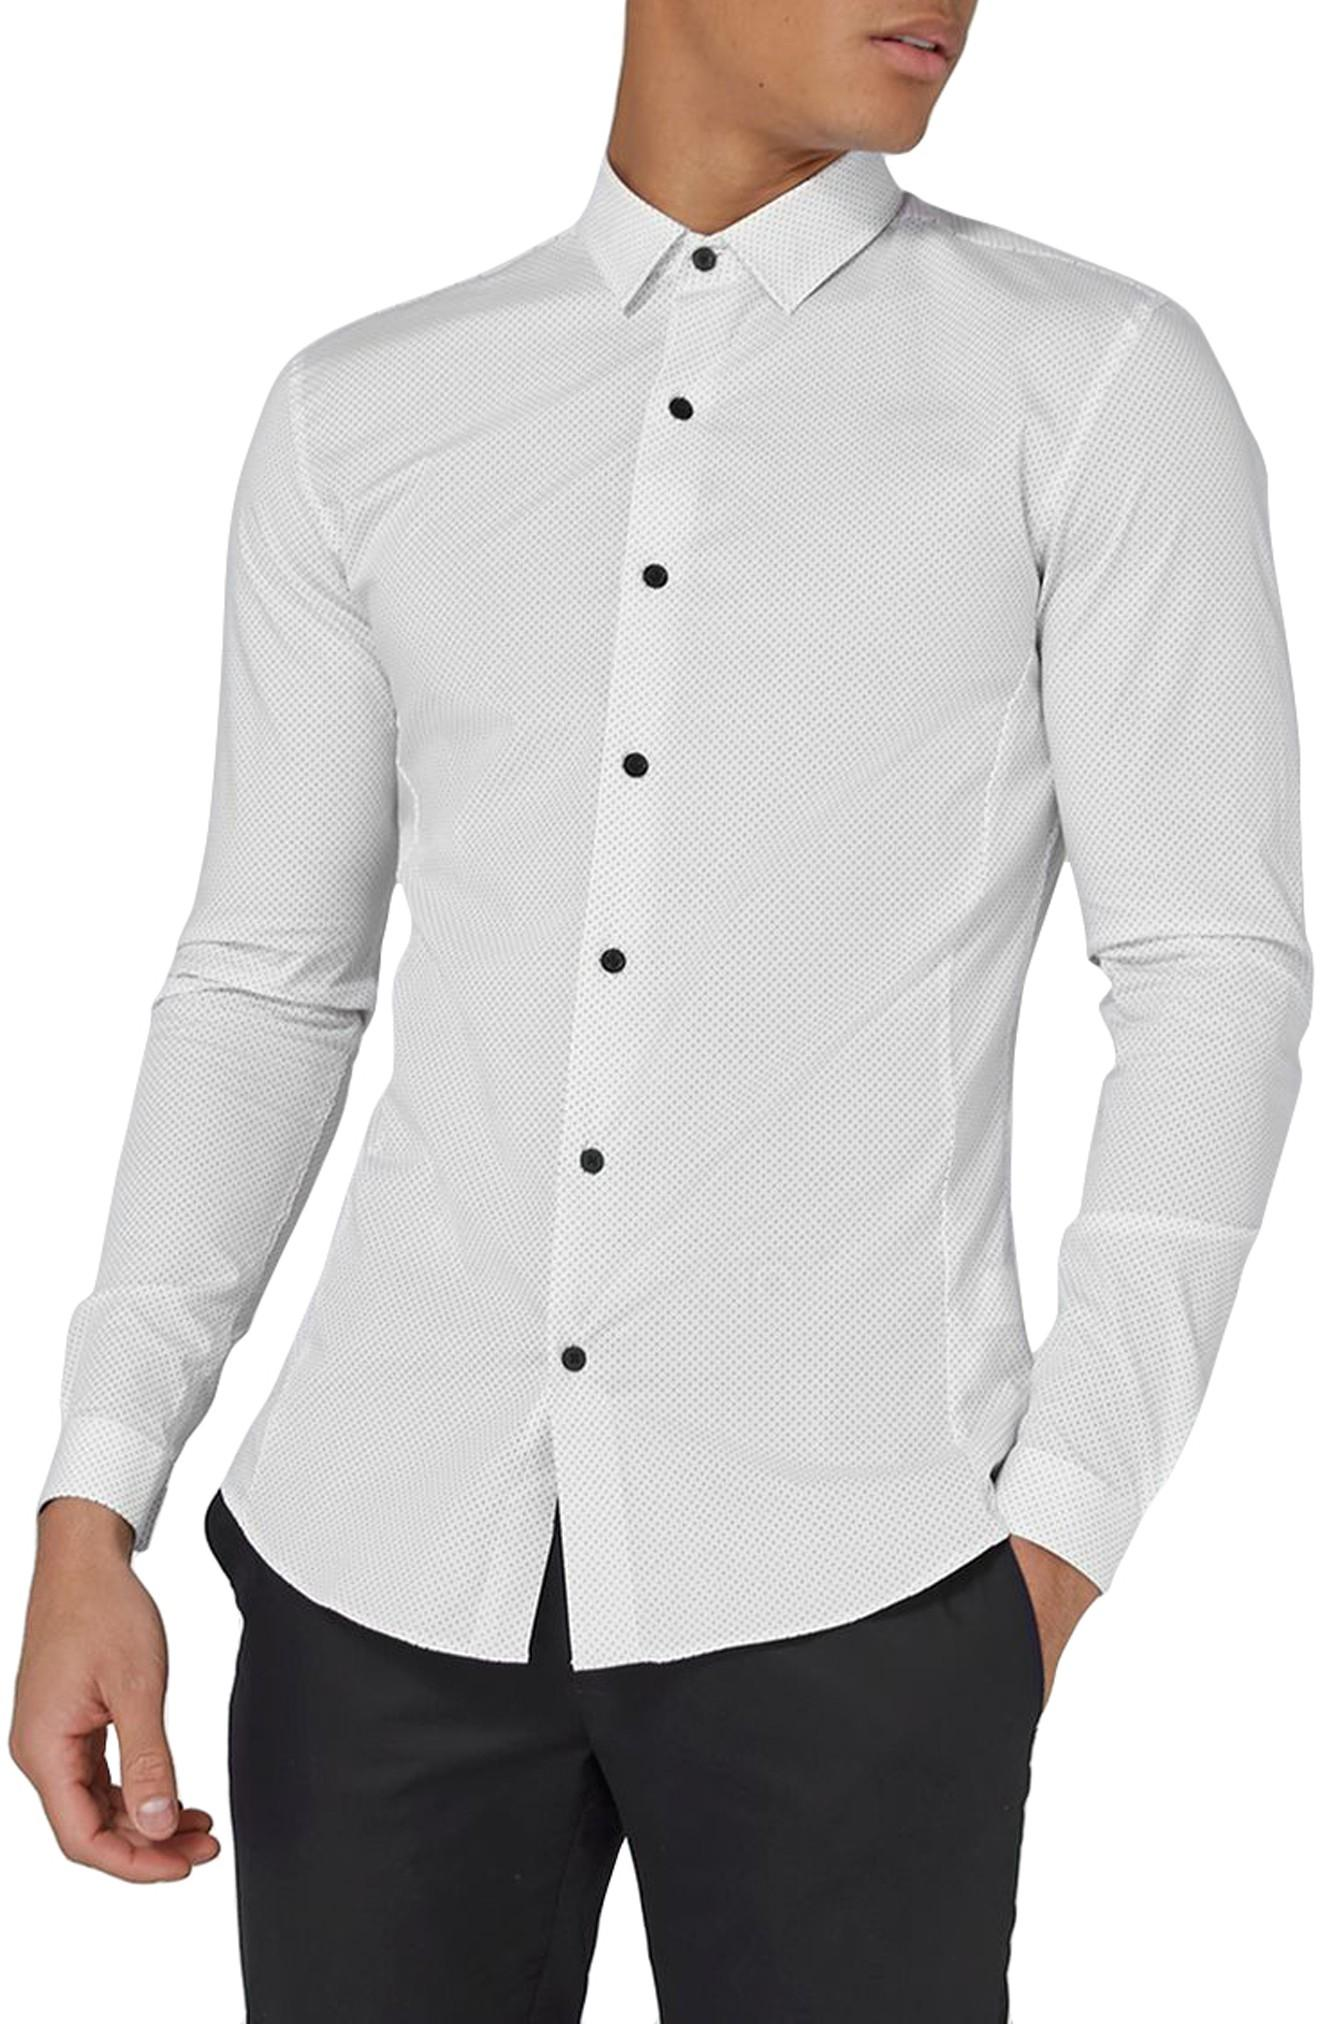 Topman Muscle Fit Polka Dot Sport Shirt In White Multi